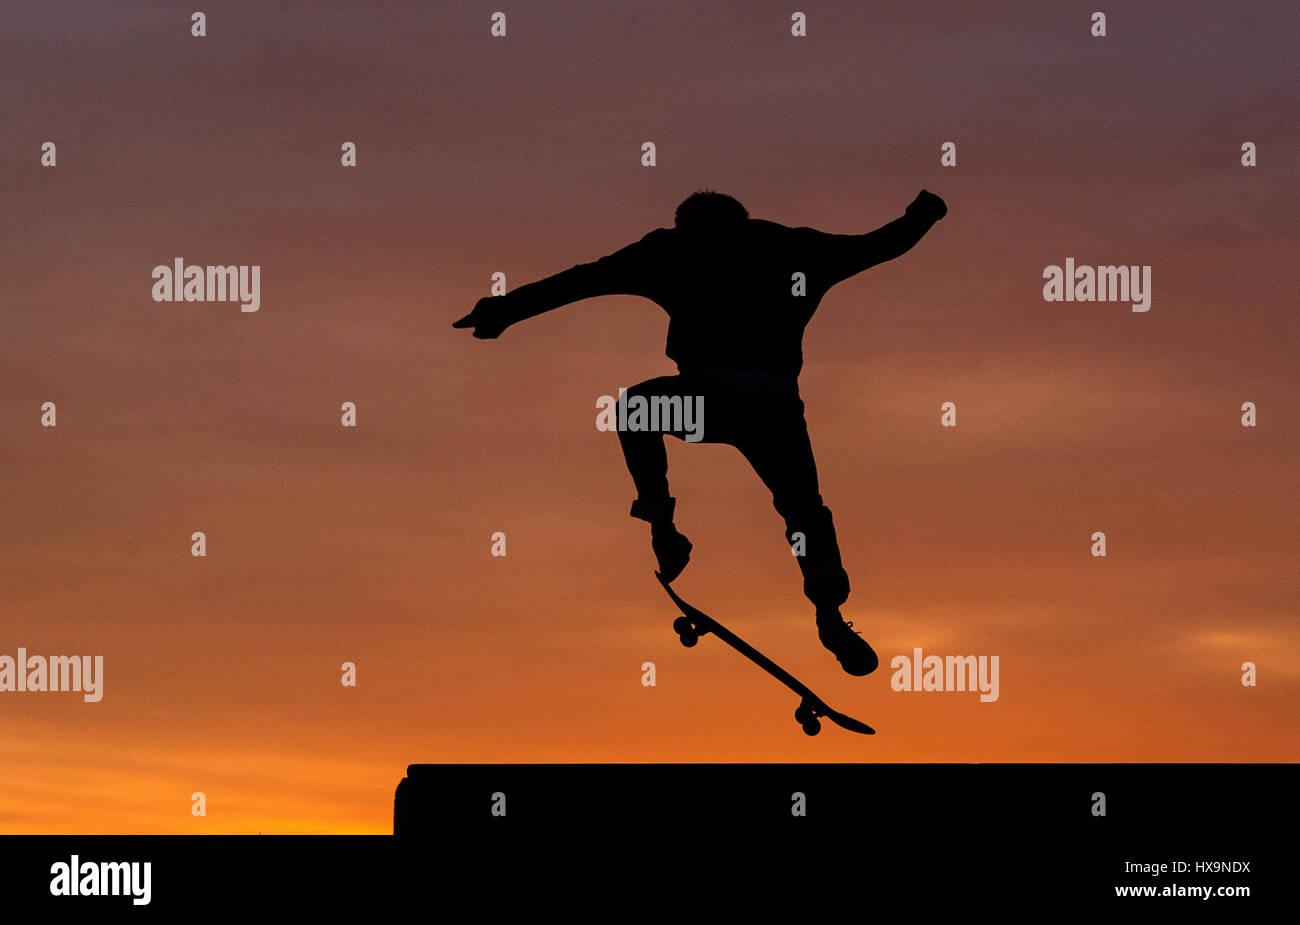 Berlín, Alemania. 25 Mar, 2017. Un patinador en acción al atardecer en TEMPELHOFER FELD (lit. Campo de Tempelhof Foto de stock